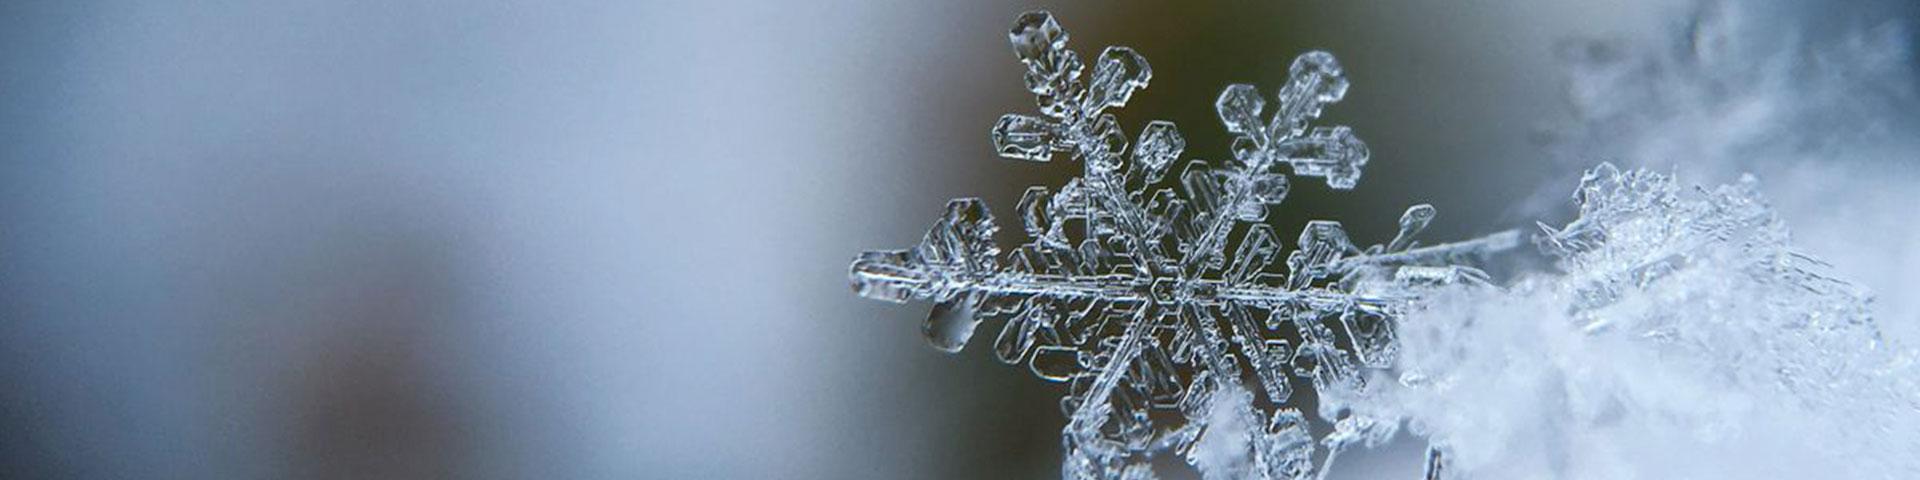 Close up of a snowflake